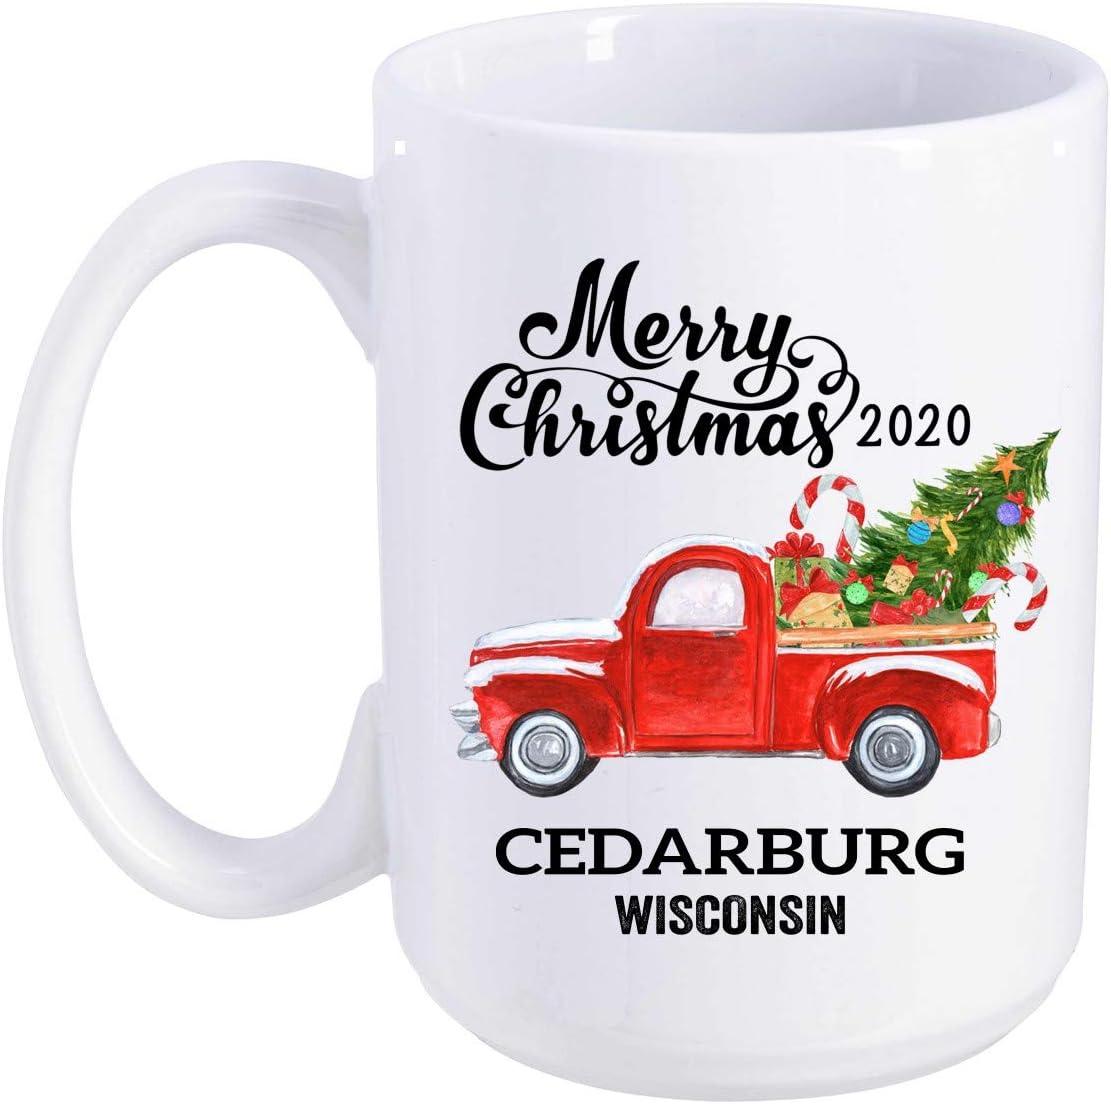 Cedarburg, Wi Christmas 2020 Amazon.com: Cedarburg Wisconsin State Family New Home Mug 2020